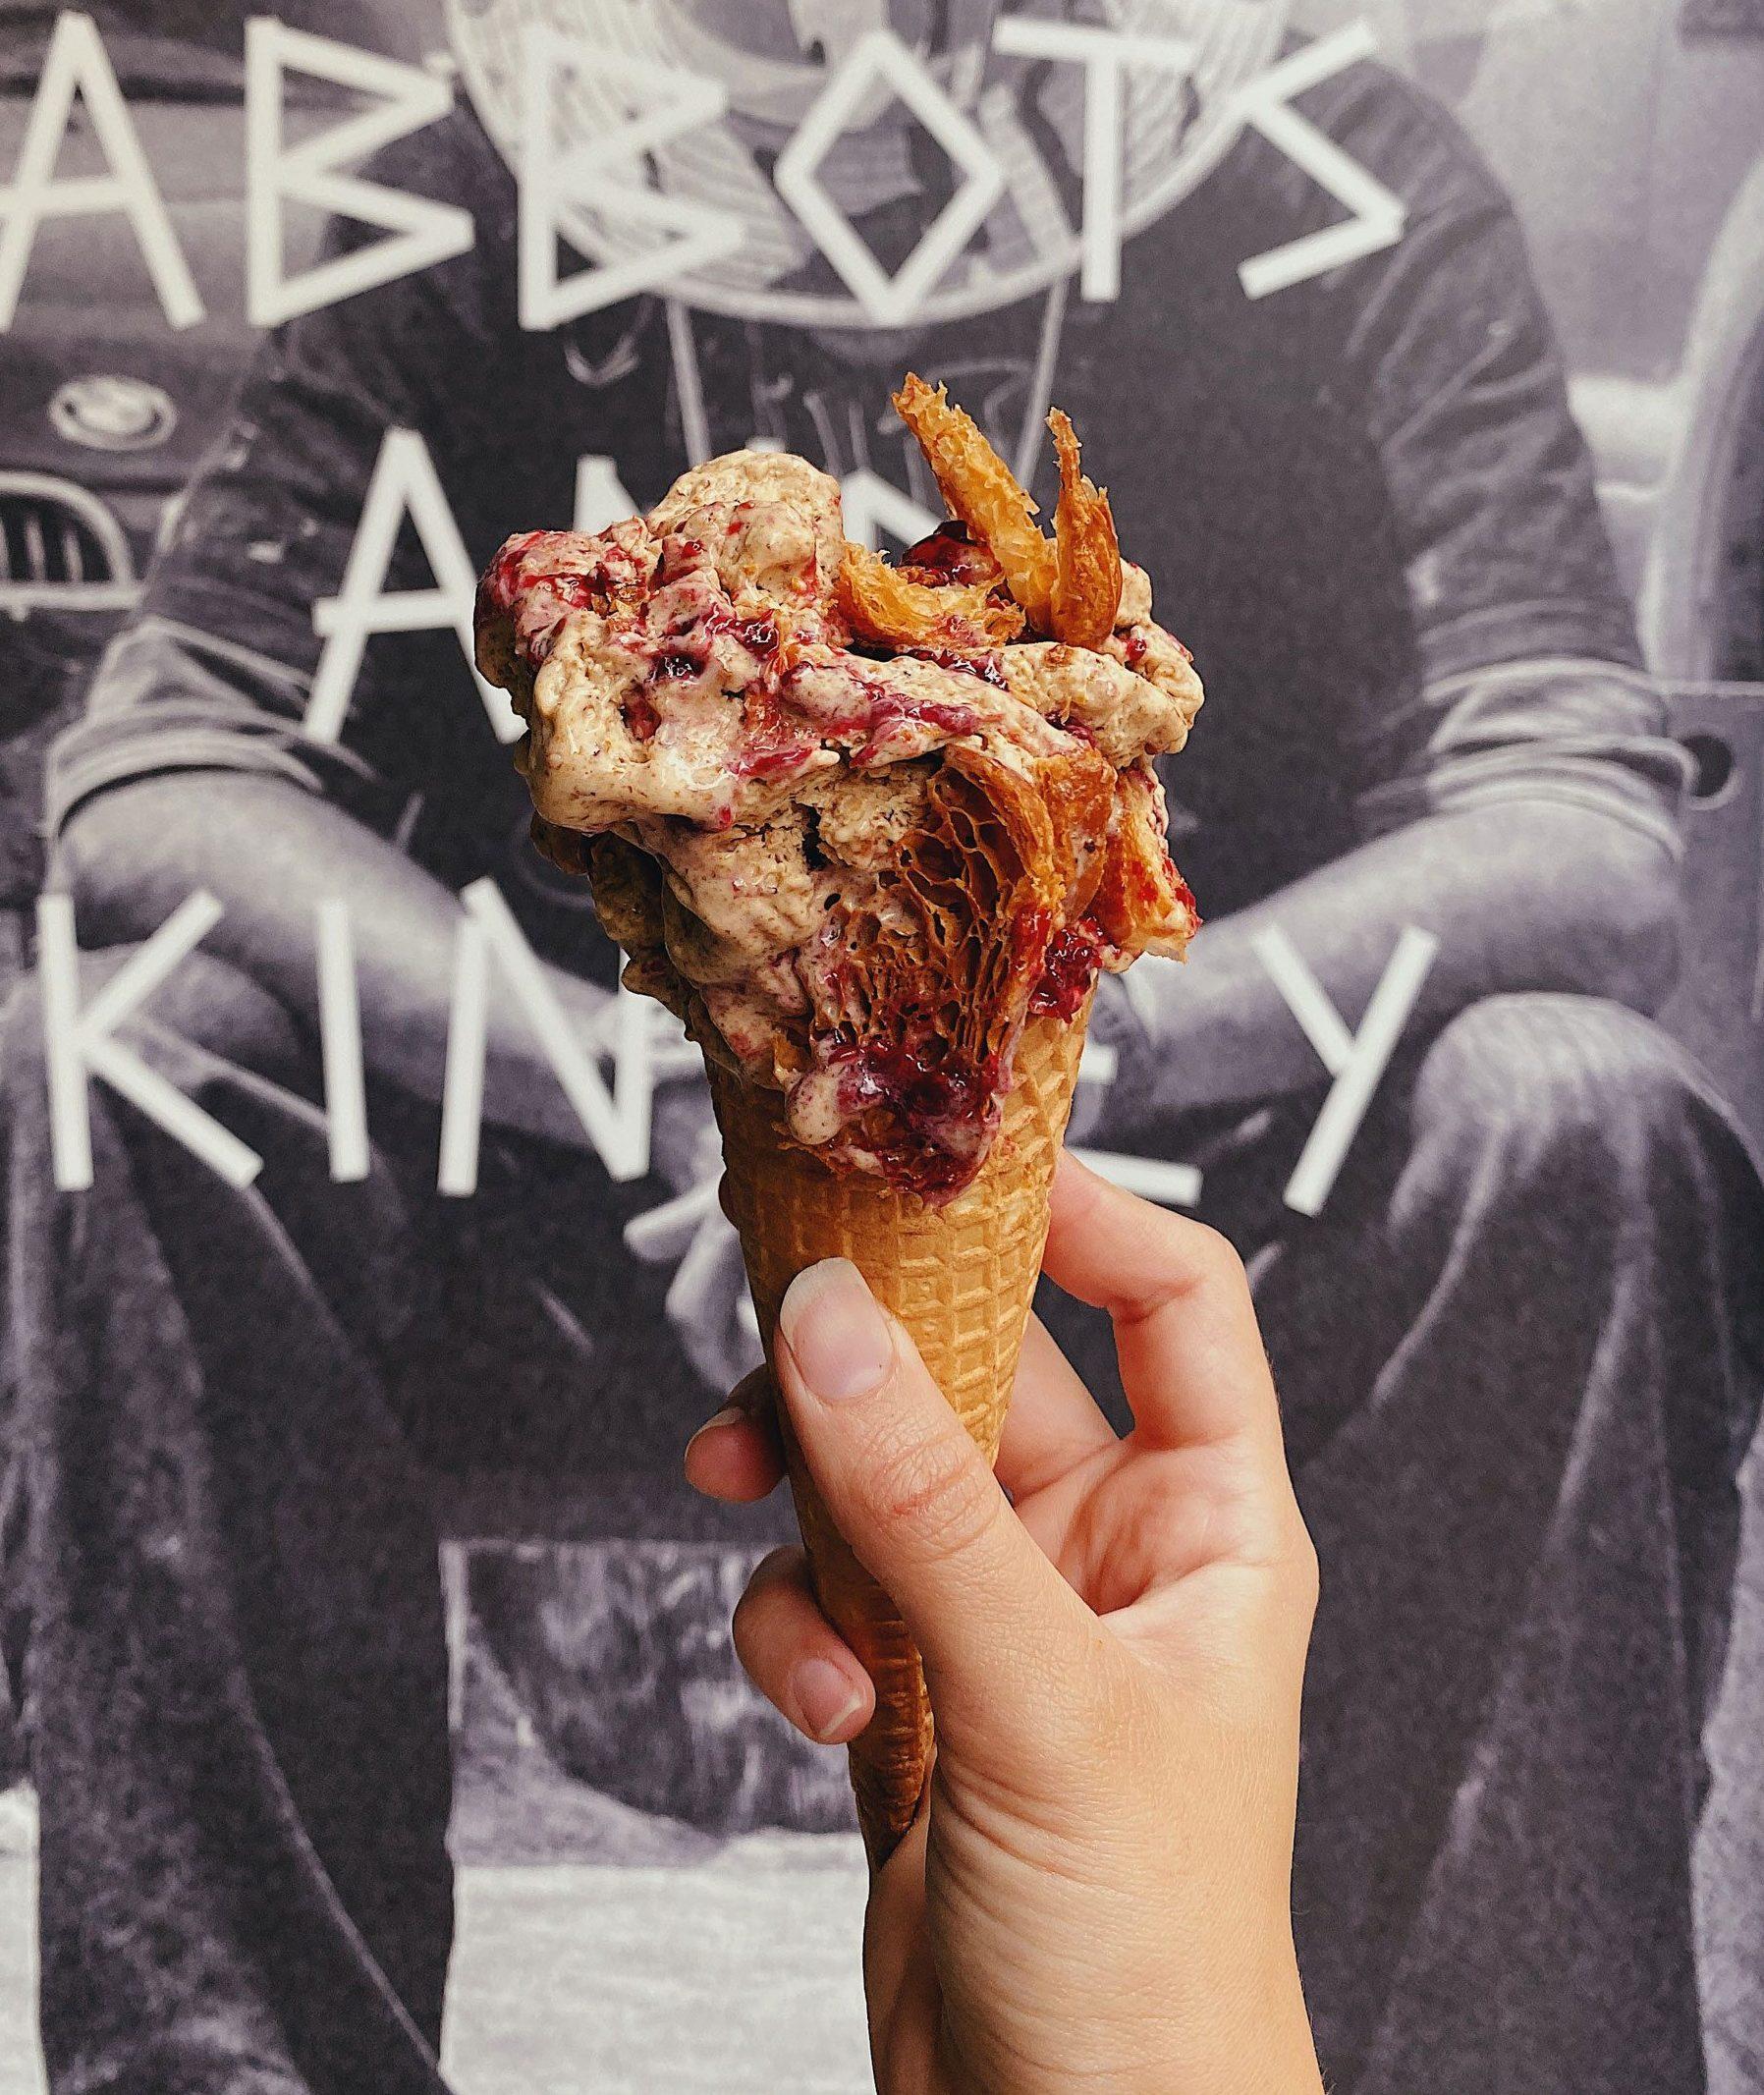 Ice cream abbots and kinney